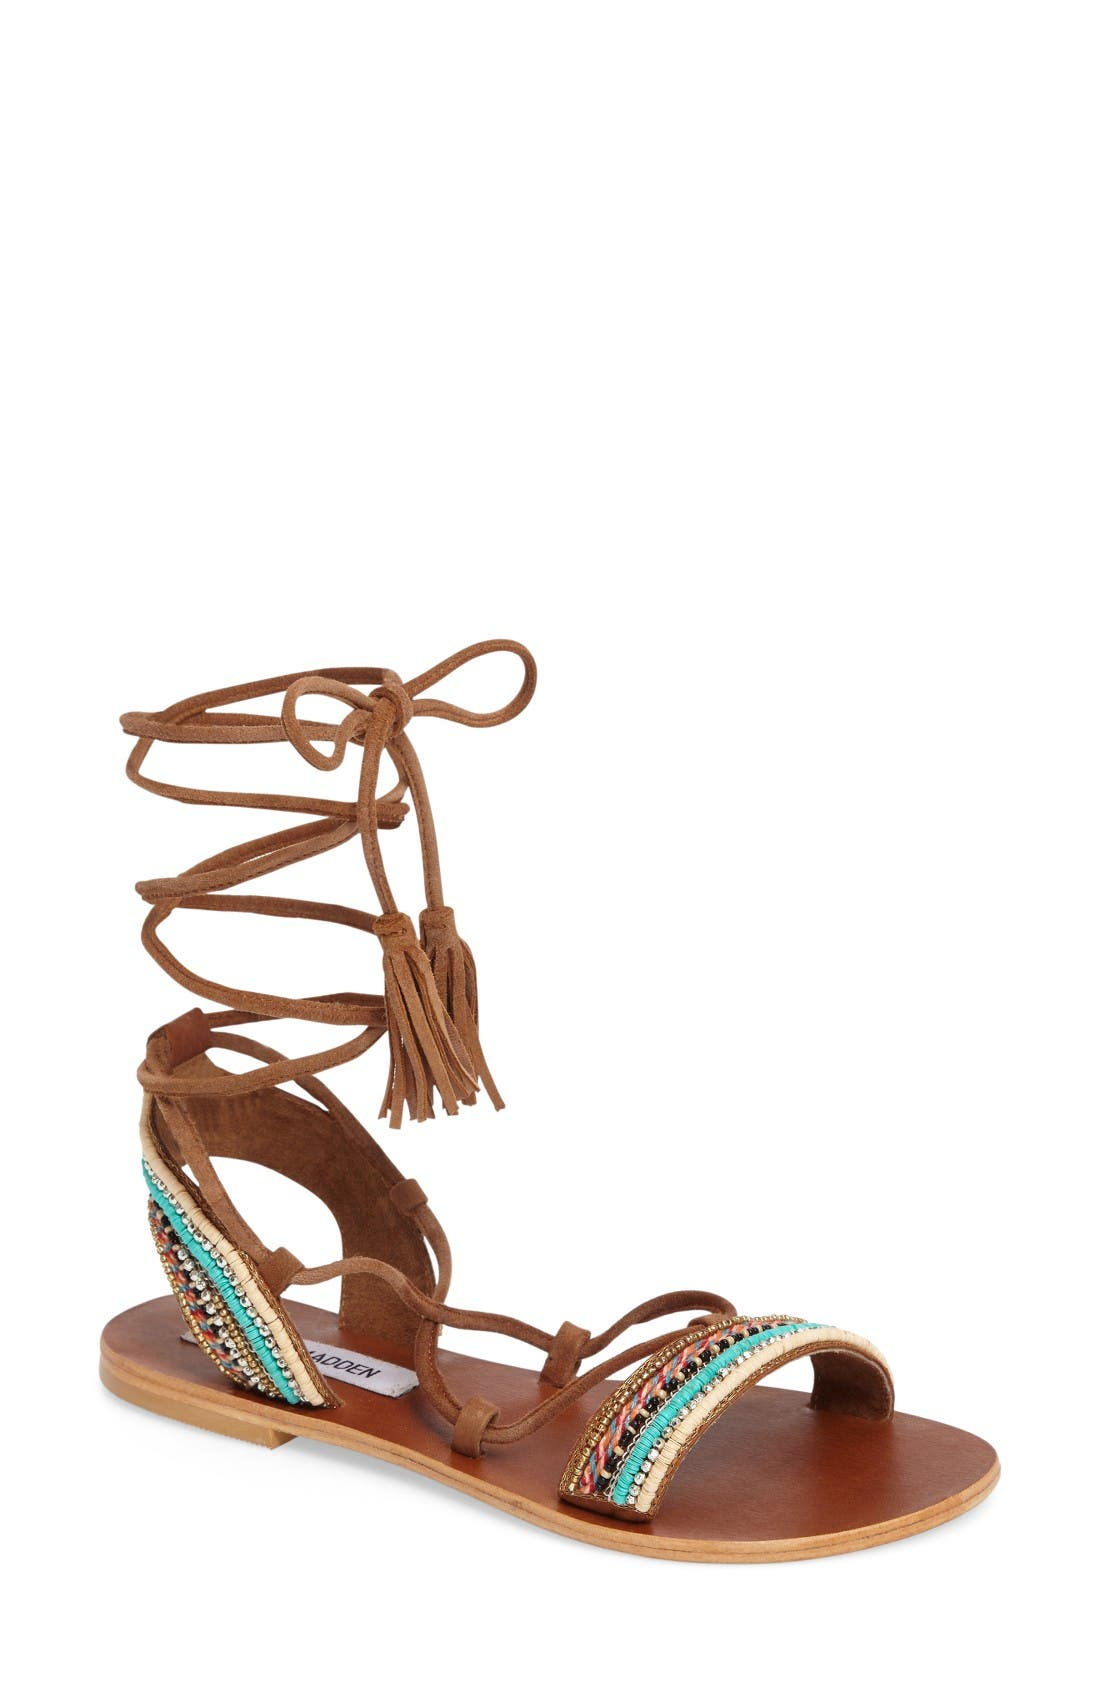 Alternate Image 1 Selected - Steve Madden Orva Embellished Ghillie Wrap Sandal (Women)